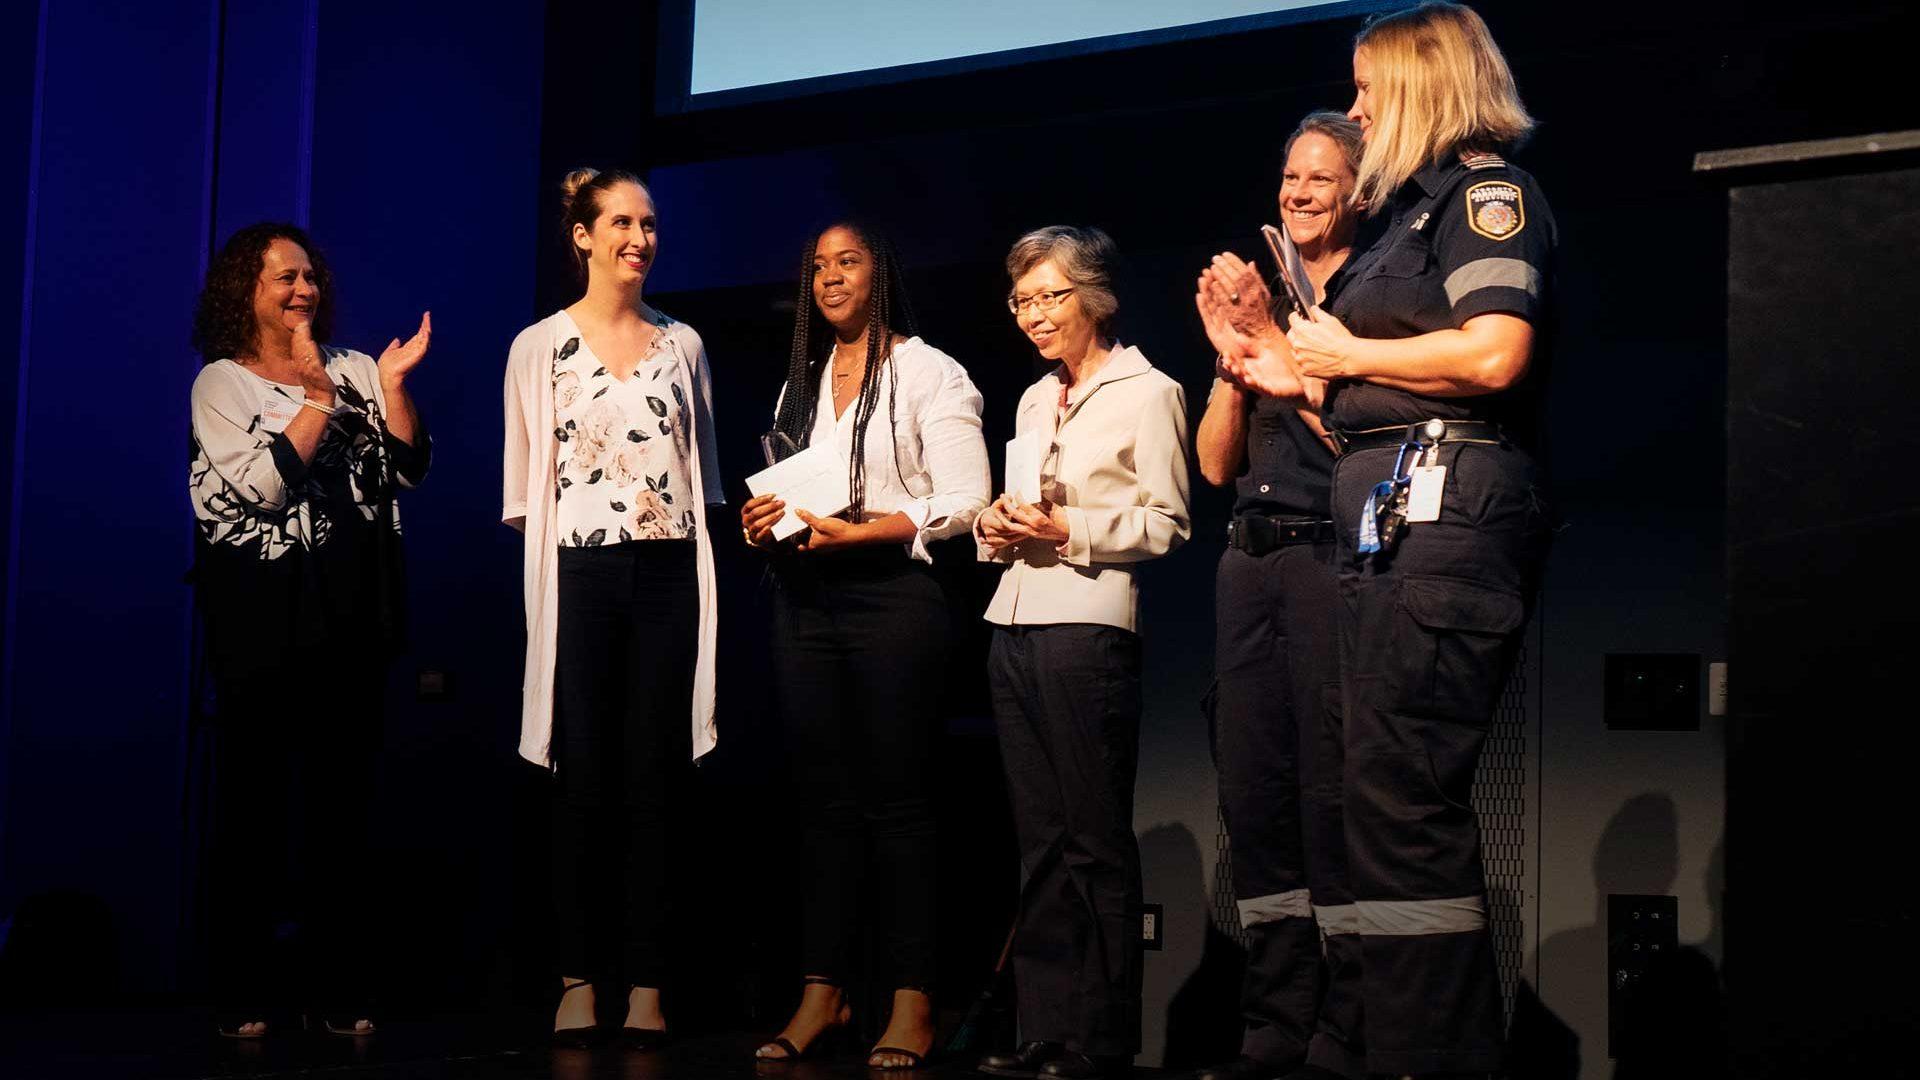 Community Paramedic Led Clinic award for successful partnership innovative service inspiring change award event